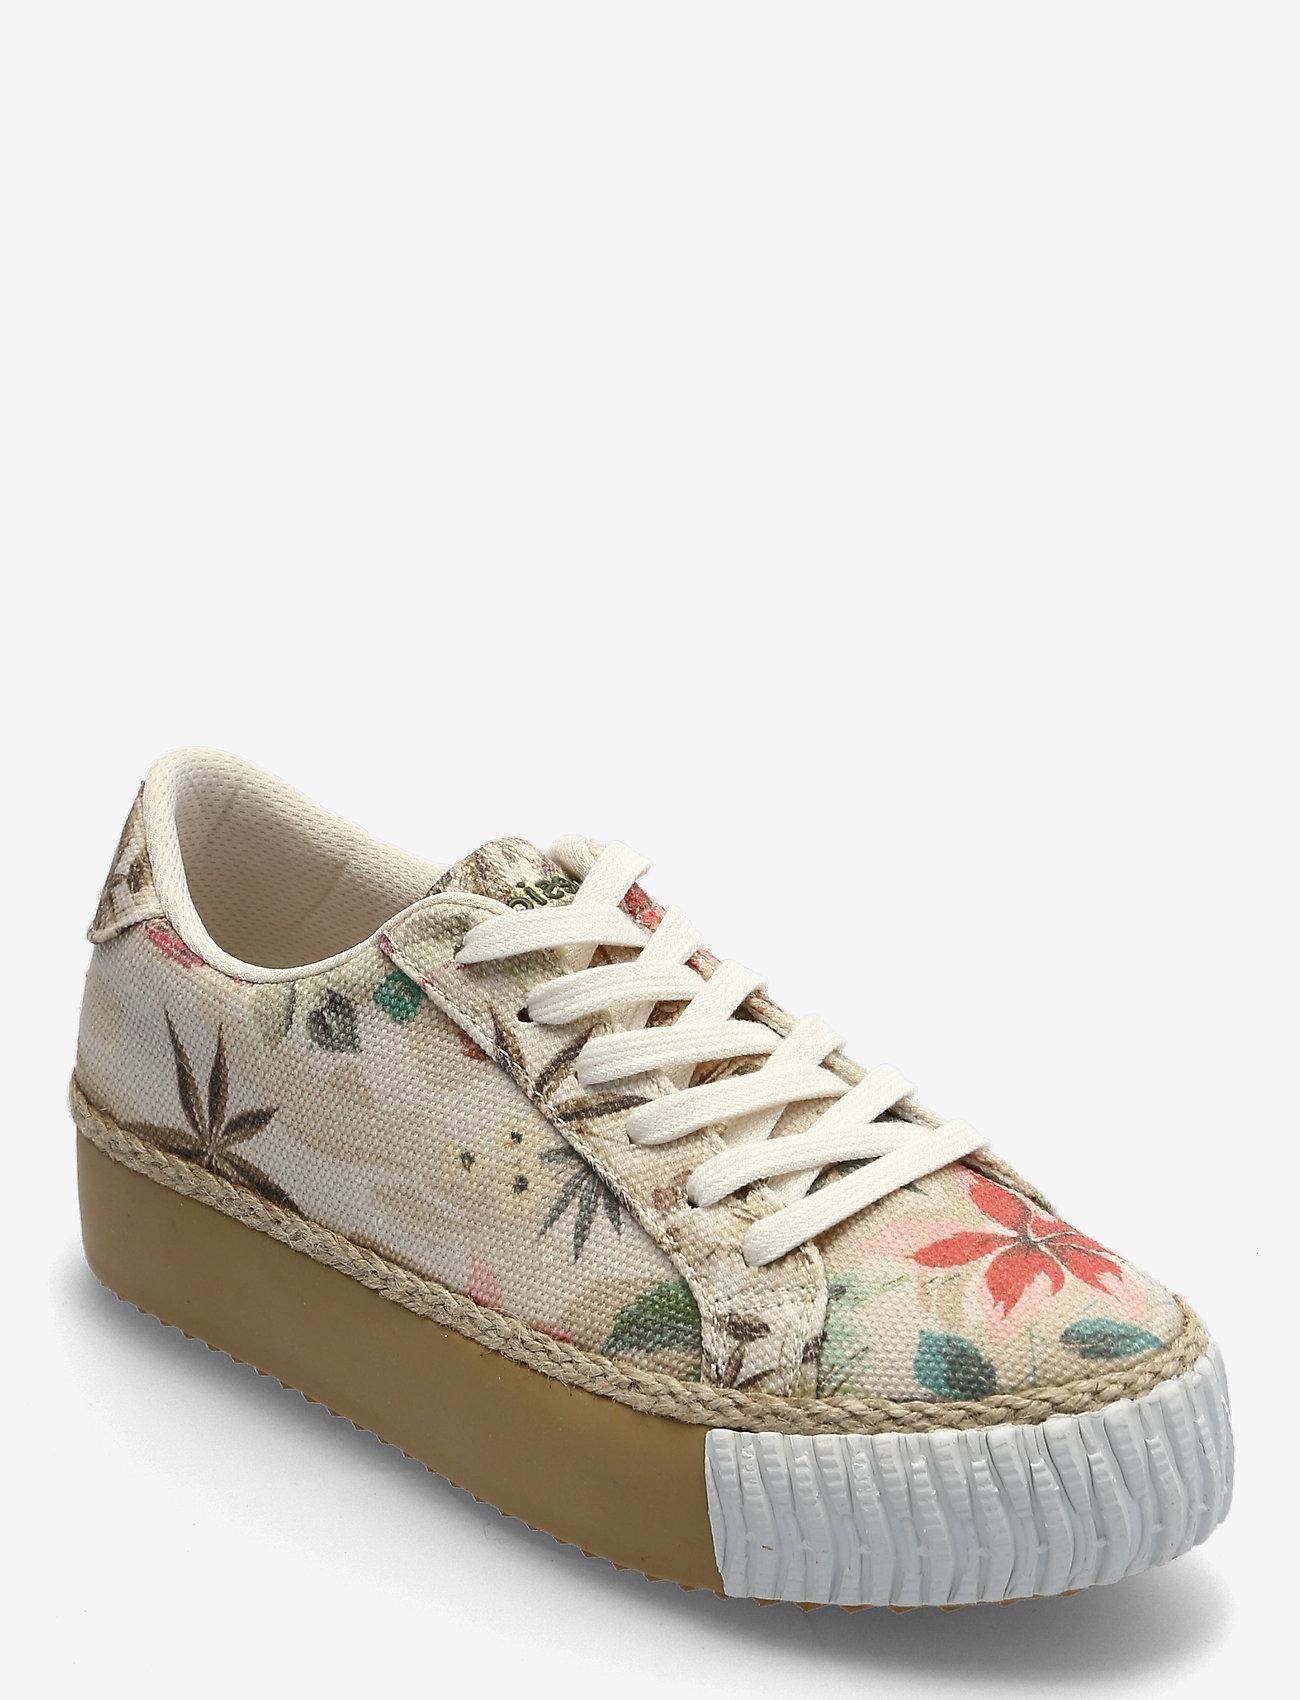 Desigual Shoes - SHOES STREET CAMOFLOWERS - låga sneakers - fog - 0